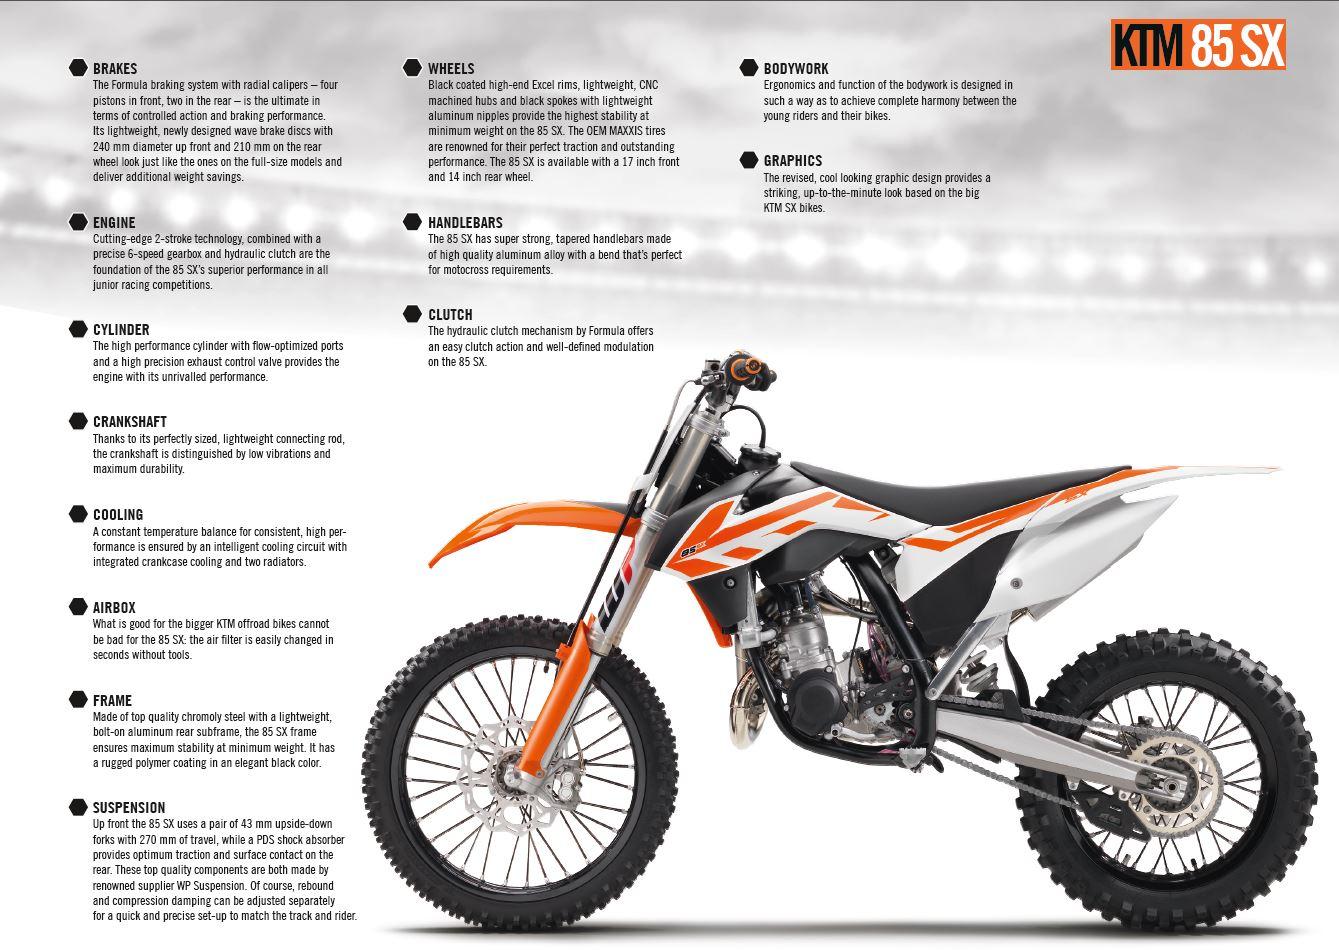 dirt bike magazine | first 2017 models: ktm 50sx, 65sx, 85sx